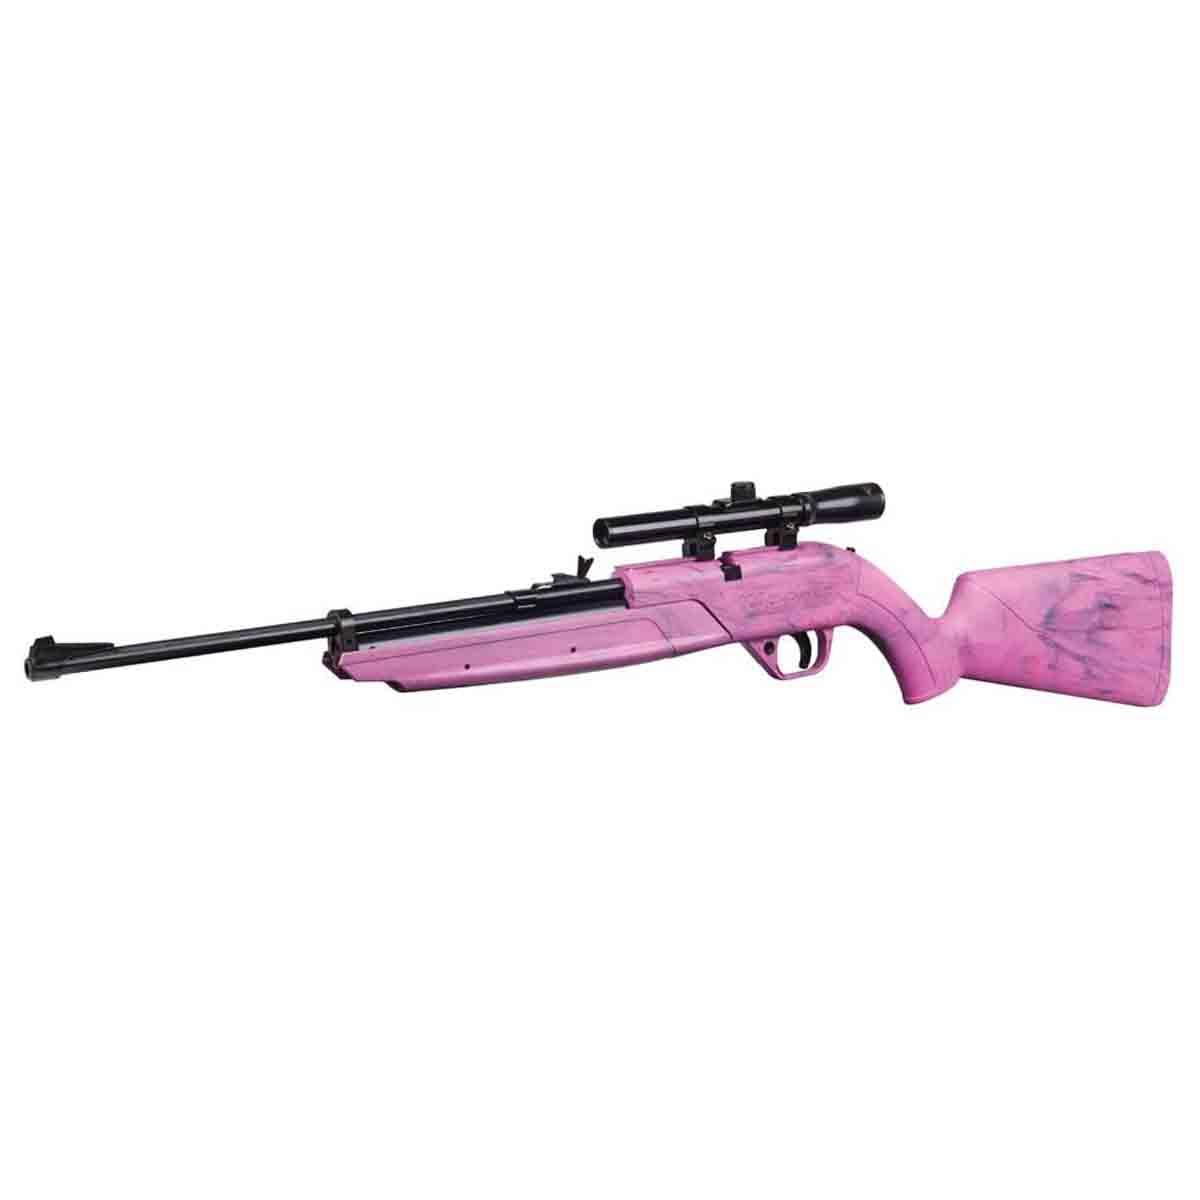 Rifle Bombeo Calibre 4.5MM 4x15 Tiro Deportivo Caza Crosman